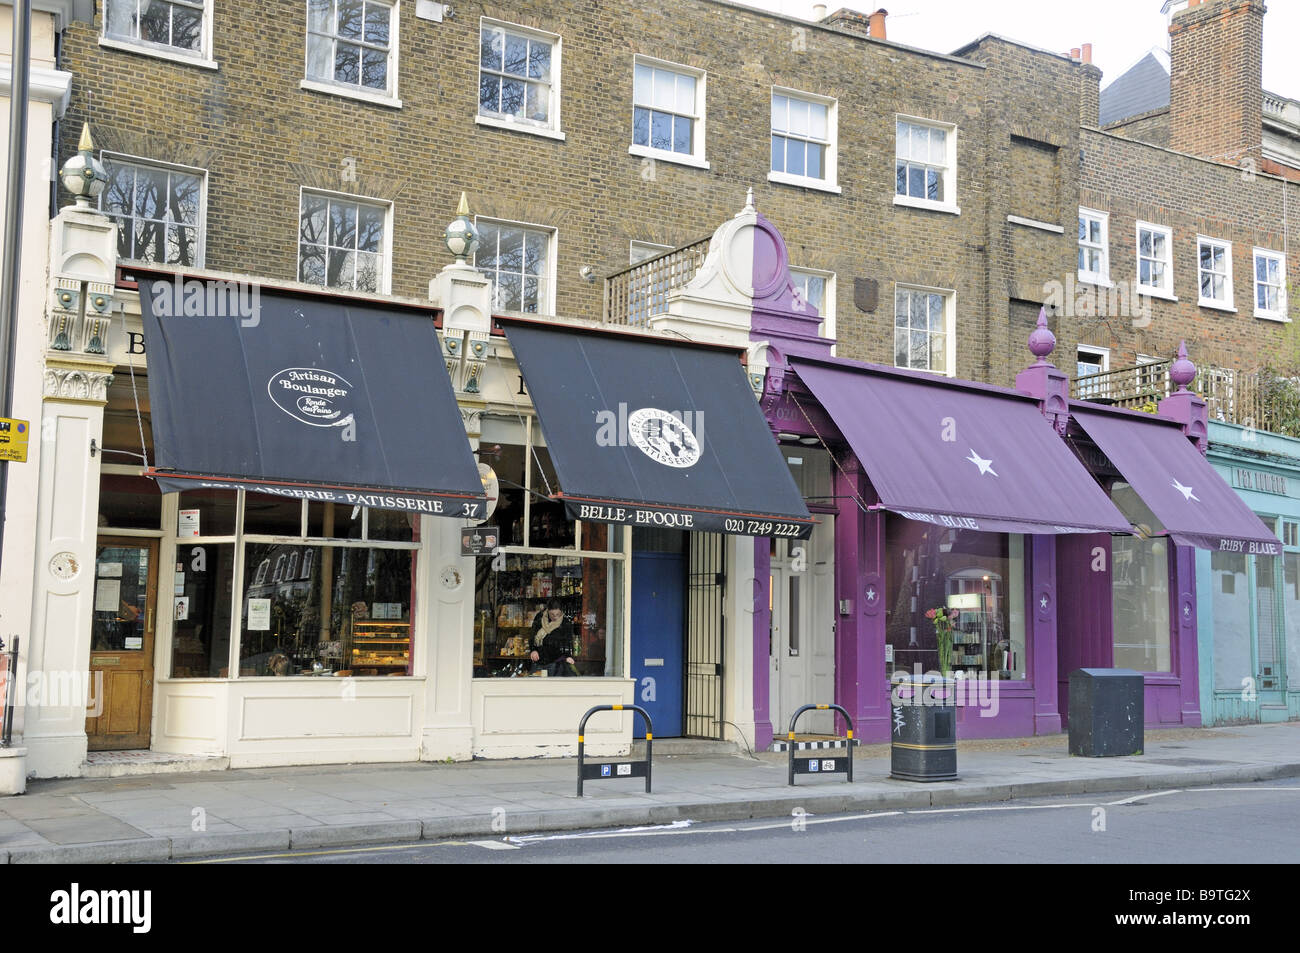 Cafe Awnings Newington Green London England UK